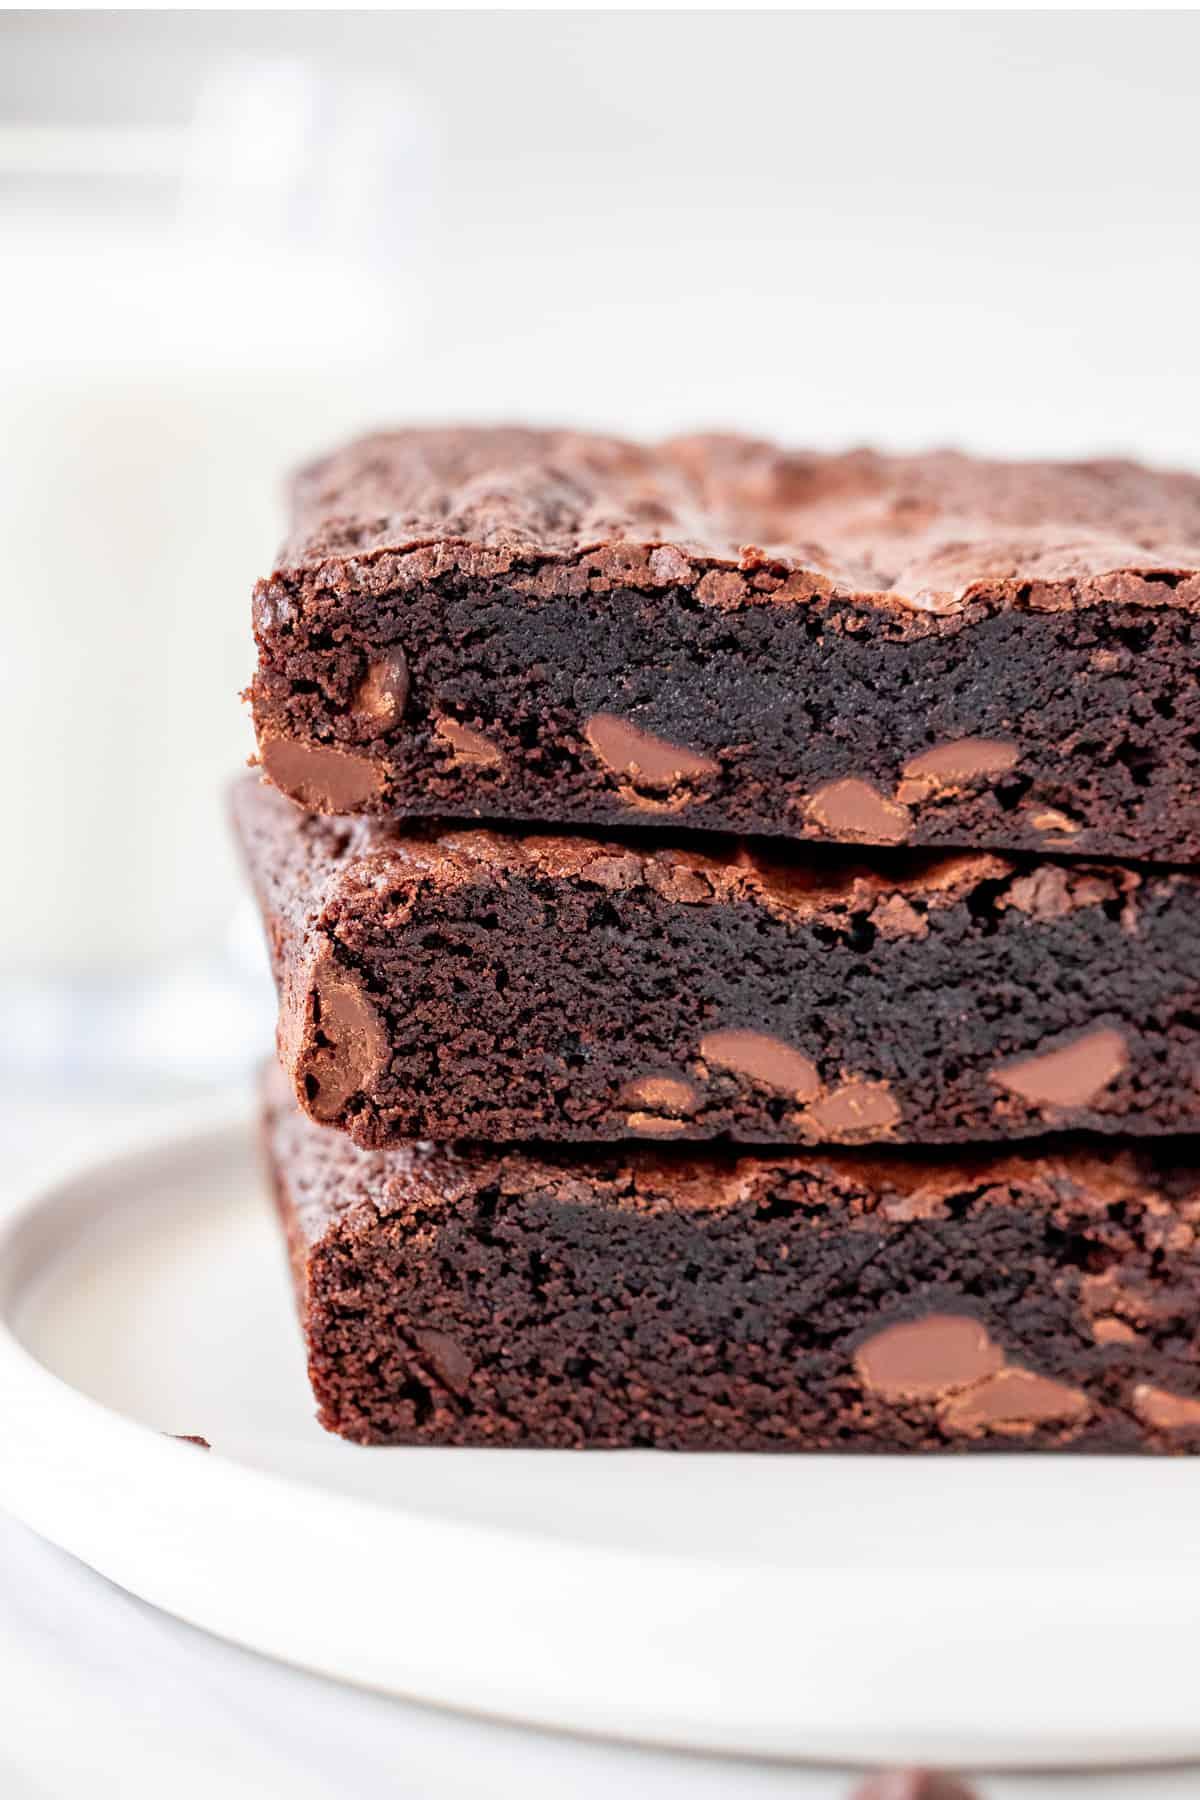 Stack of 3 brownies